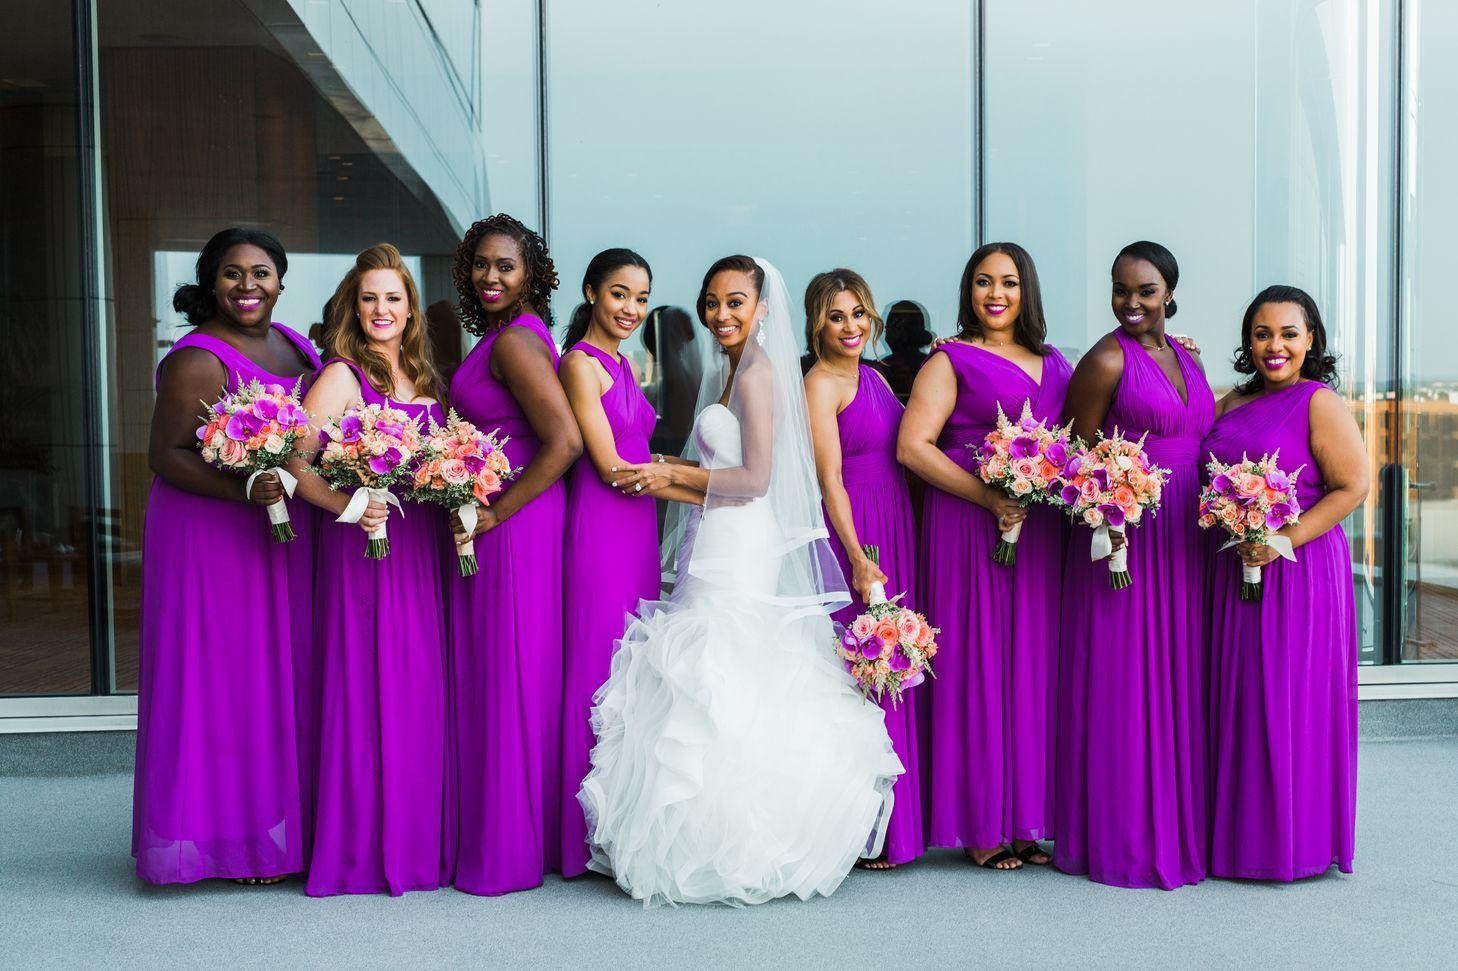 Bright Purple Bridesmaid Dresses Bright Purple Bridesmaid Dresses Purple Bridesmaid Dresses Orchid Bridesmaid Dresses